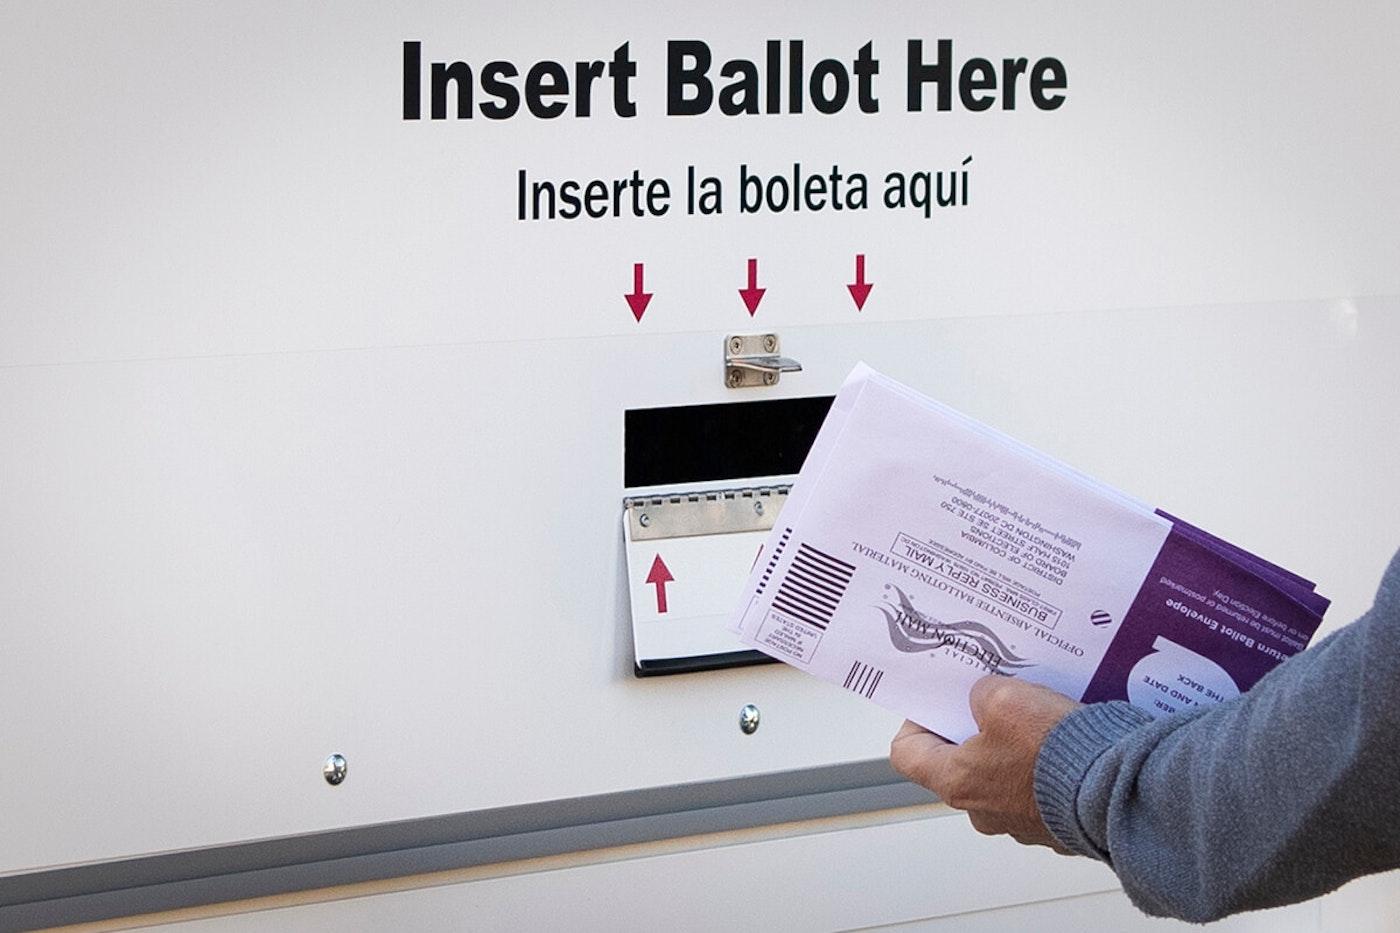 hand holding early ballots up to ballot drop box slot